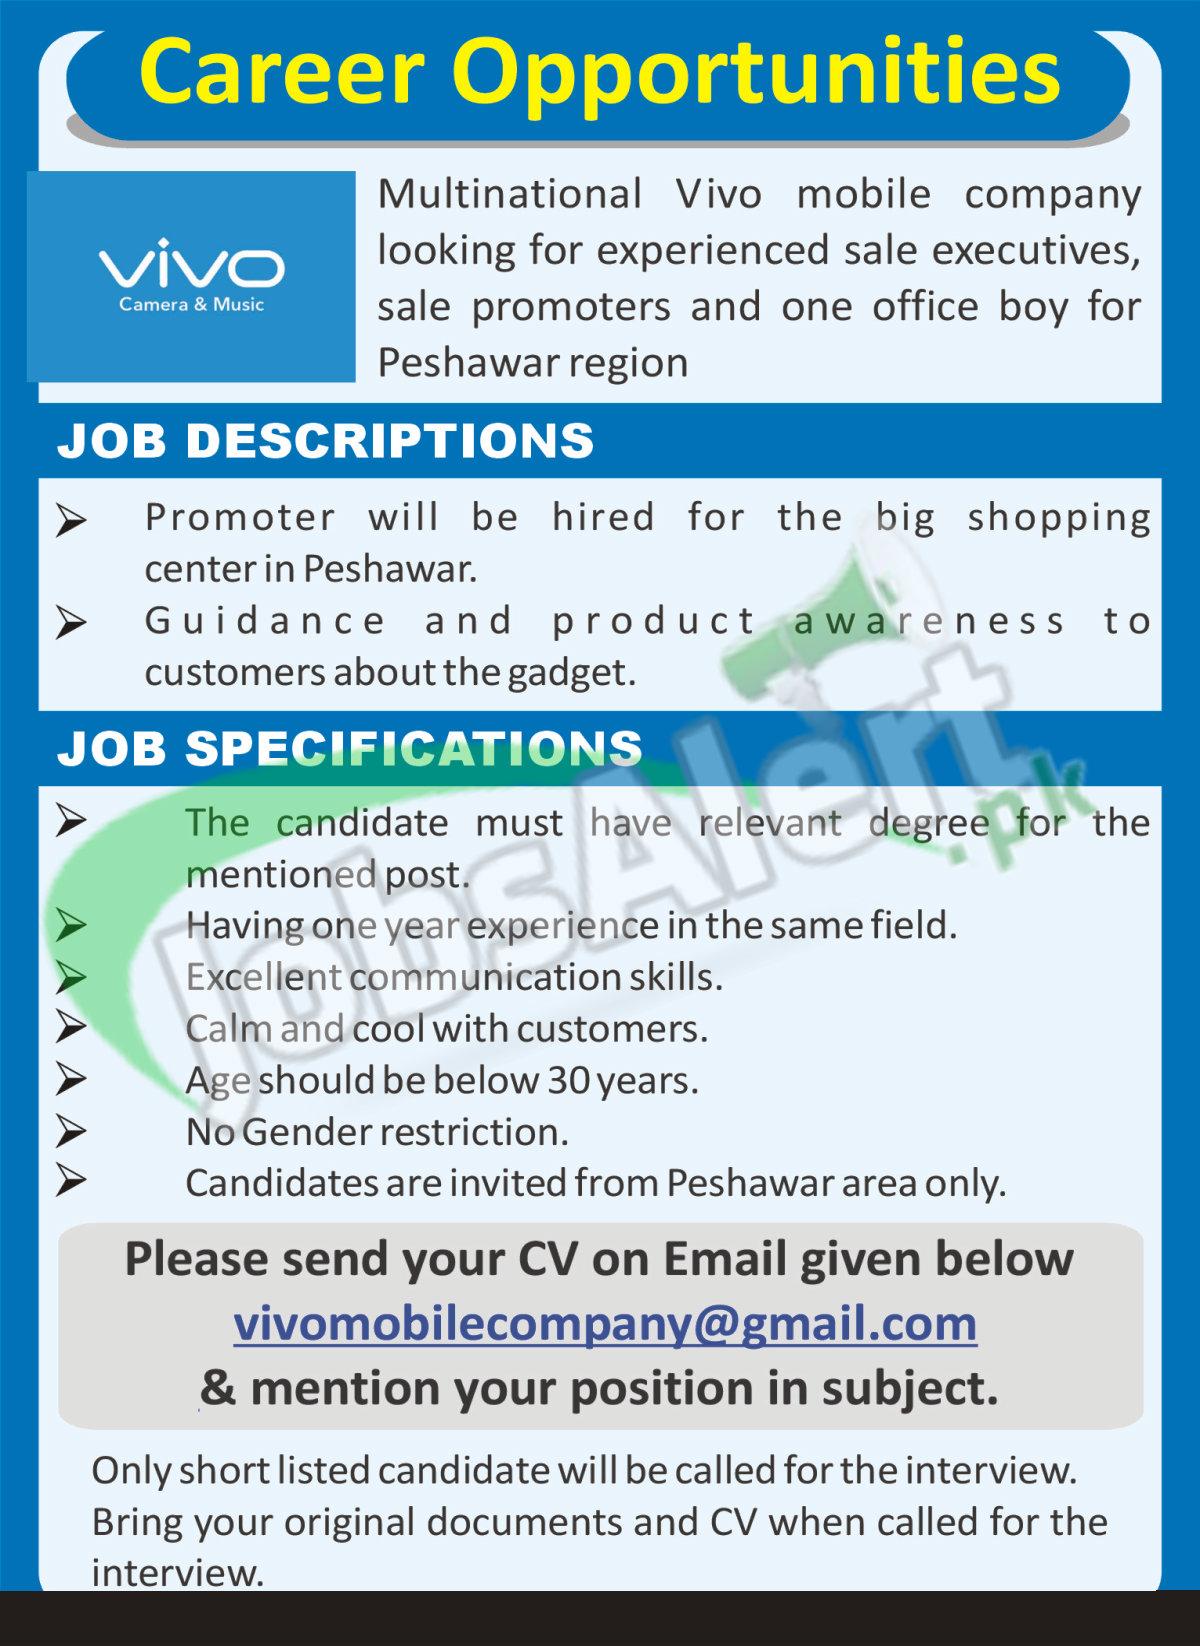 Vivo Mobile Company